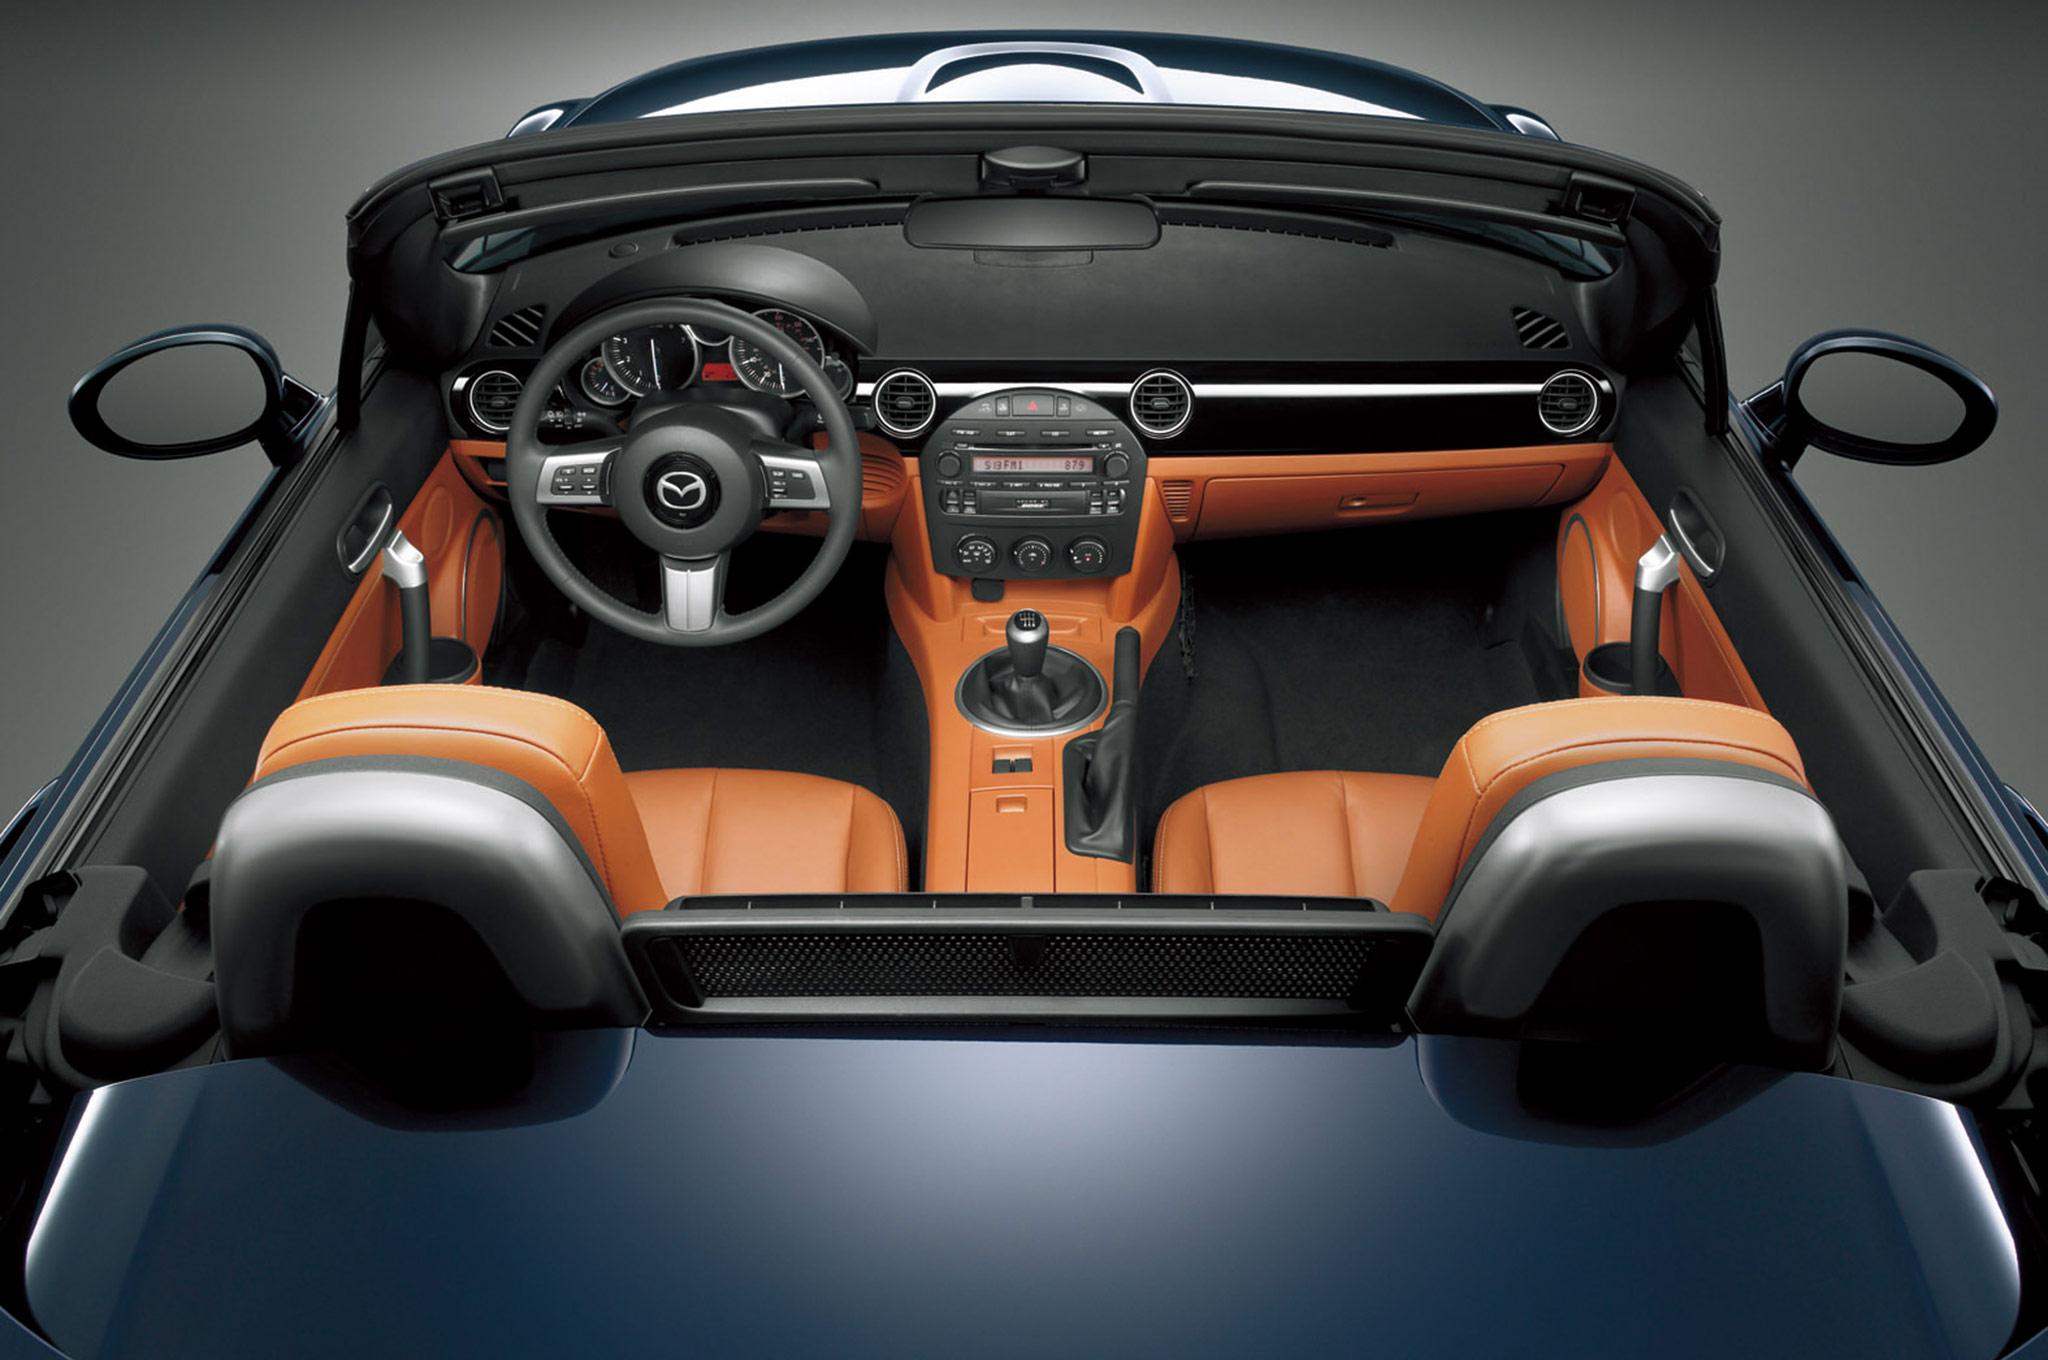 http://st.automobilemag.com/uploads/sites/11/2005/03/Third-Generation-Mazda-MX-5-Miata-interior-from-above.jpg